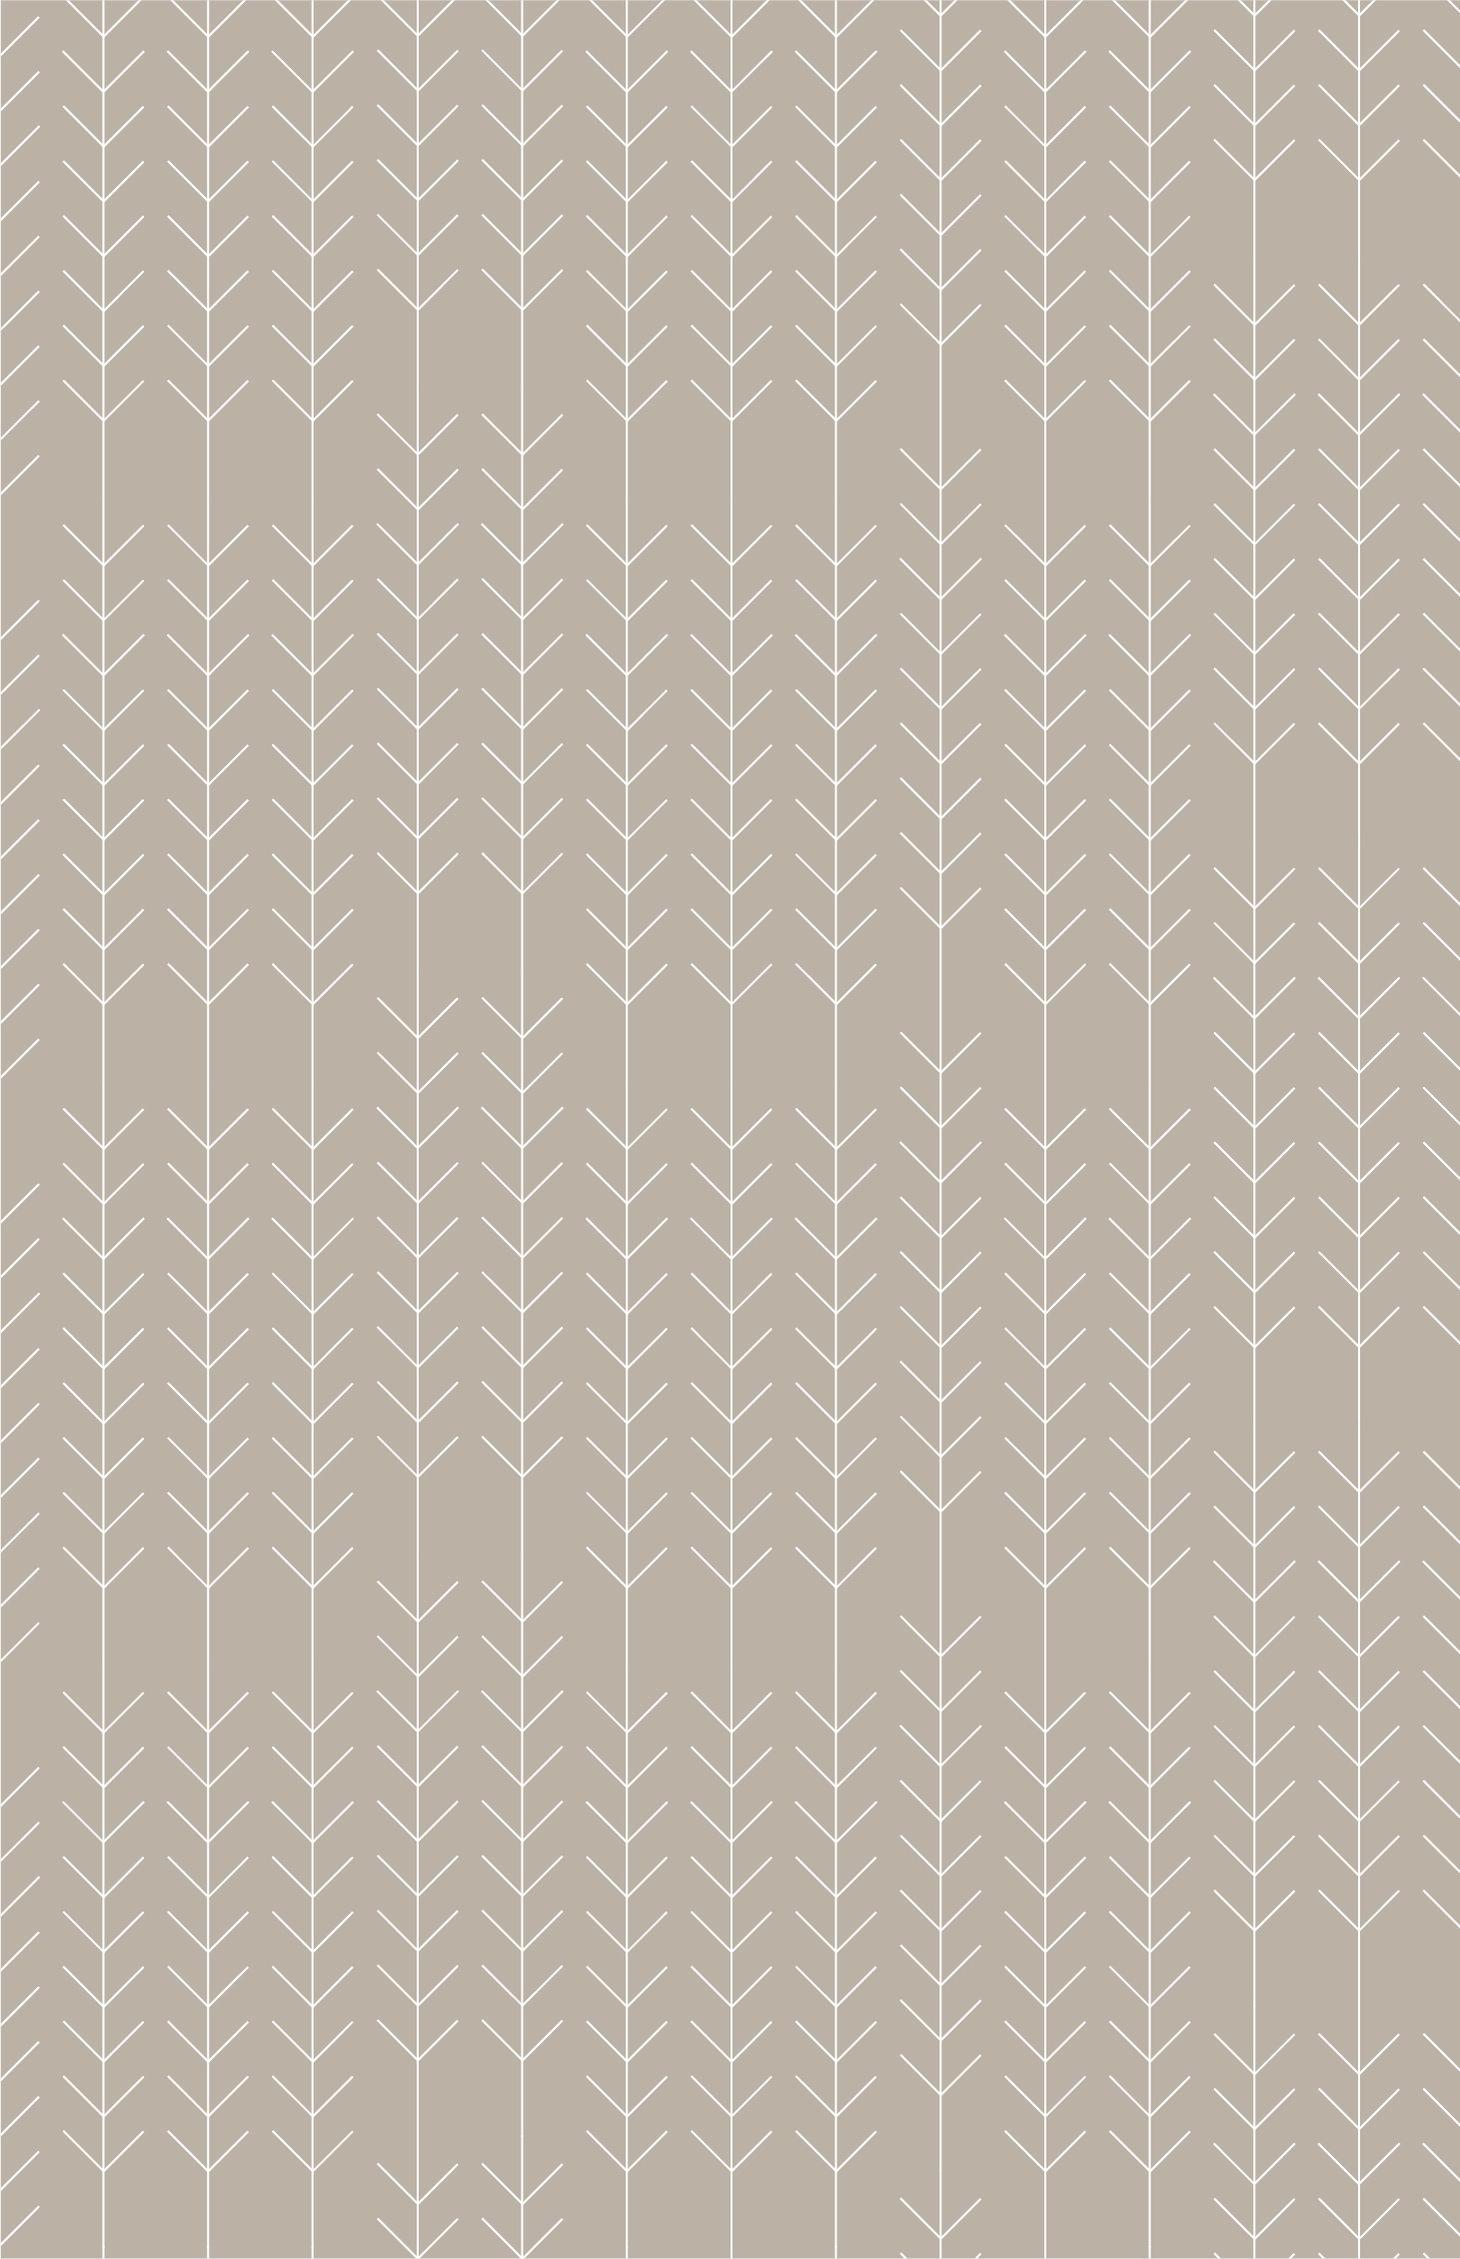 Narada_Pattern_02.jpg